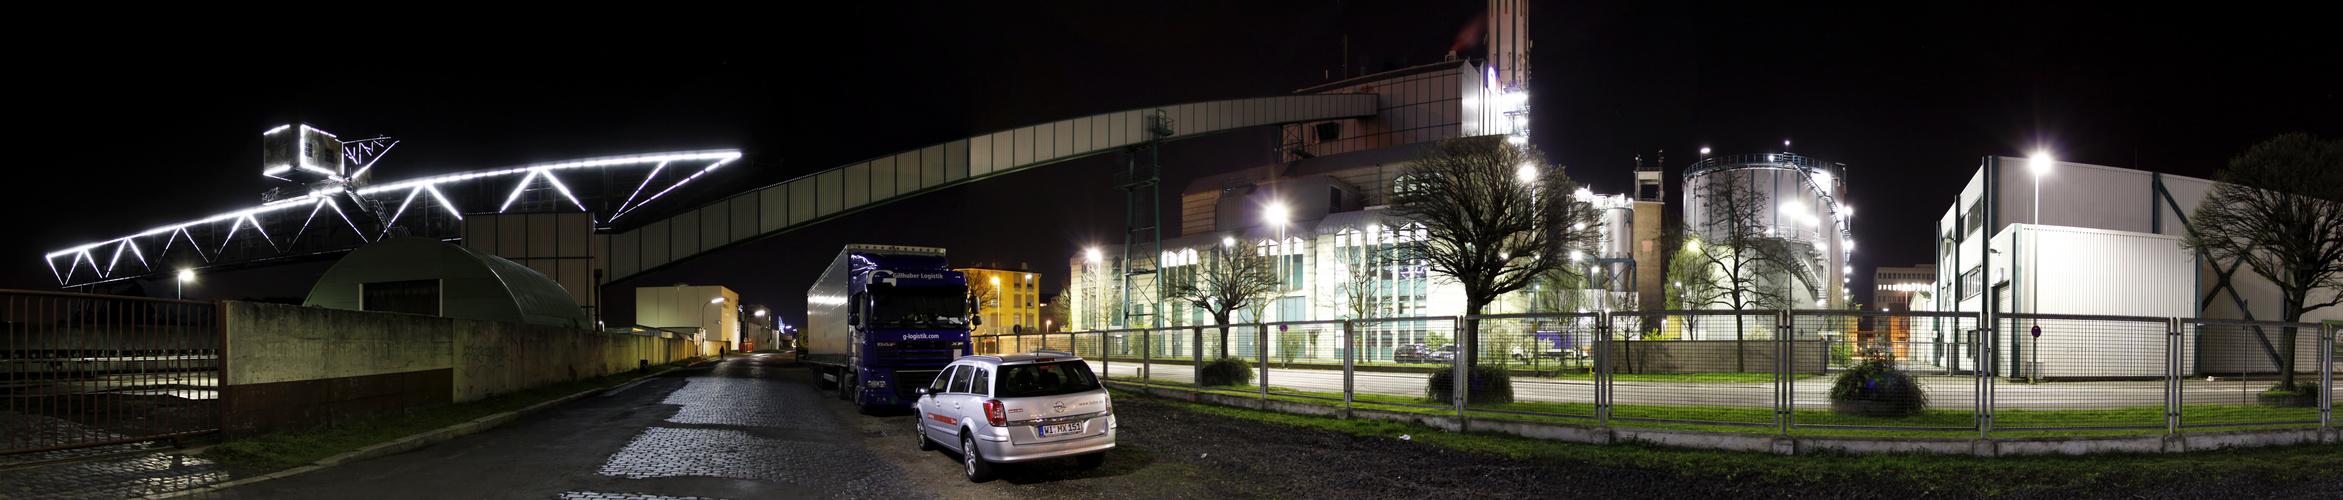 Hafen Offenbach Panorama